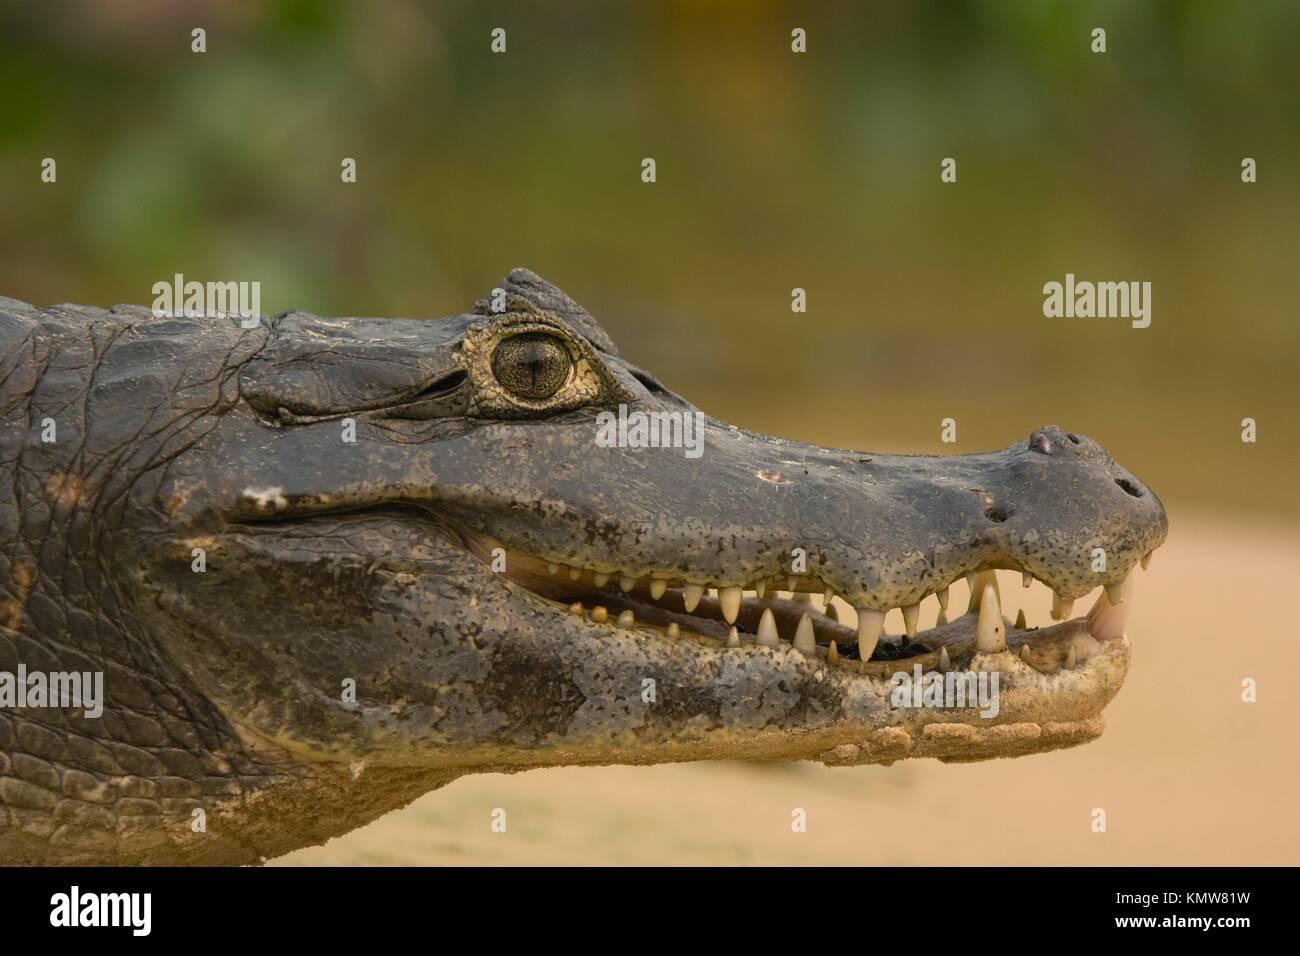 Yacare Caiman, Caiman yacare, Alligatoridae family, Crocodilia order, Pantanal, Mato Grosso, Brazil - Stock Image